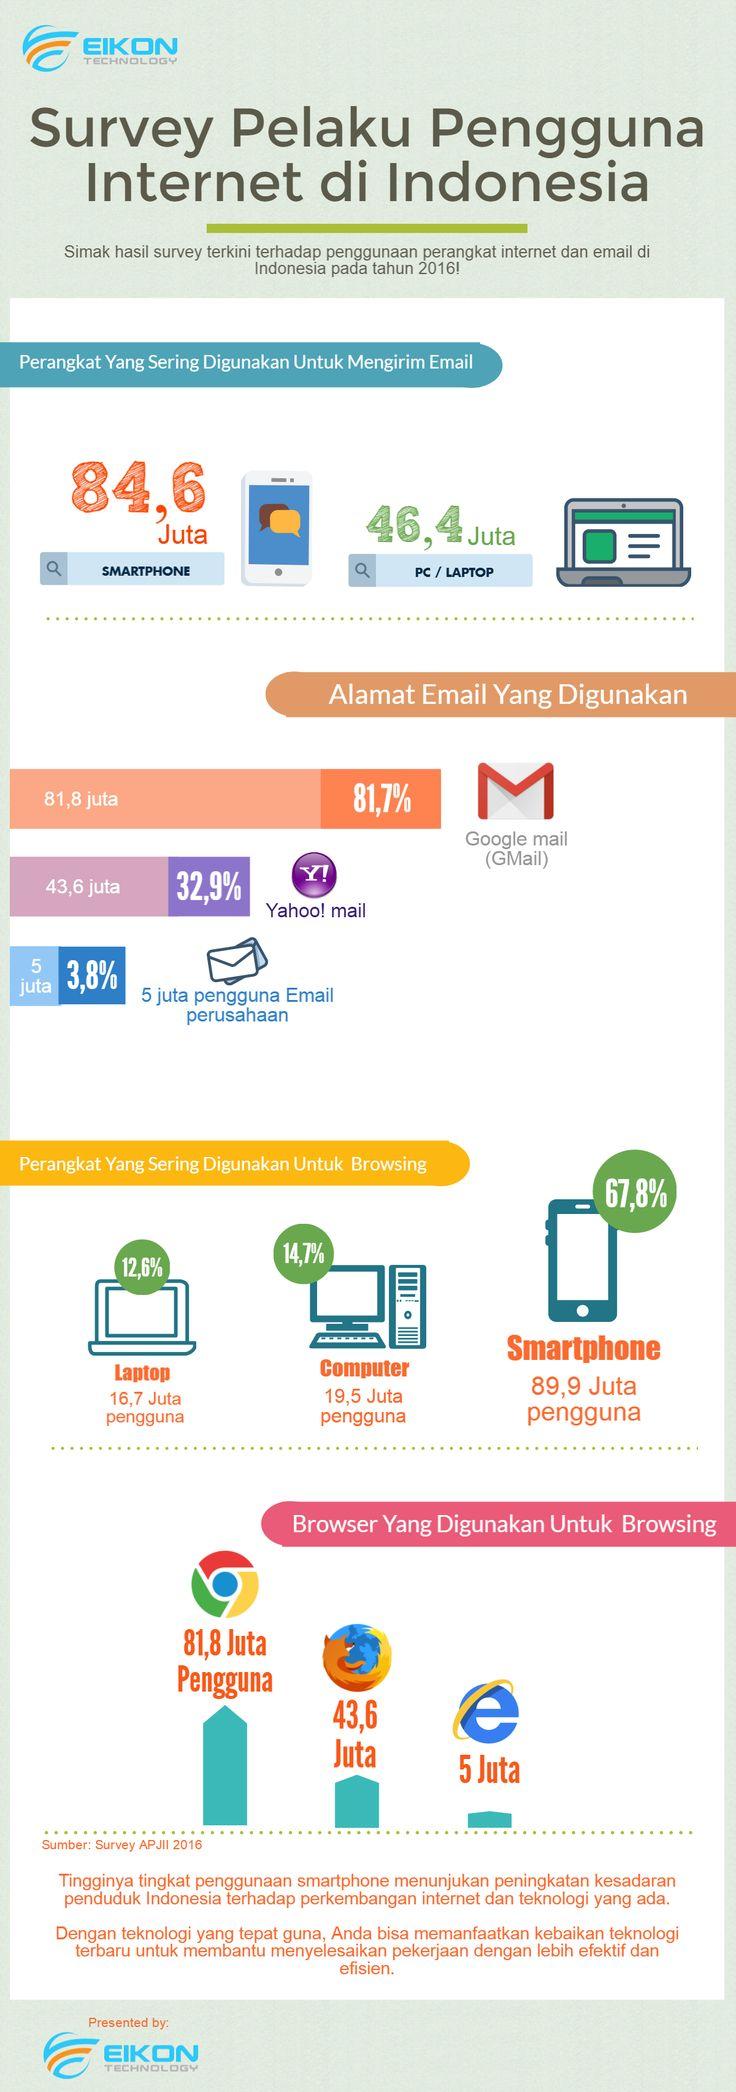 Pengguna mencapai 132 juta, Indonesia pun turut meramaikan teknologi internet di Dunia. #internet #internettechnology #survey #digital #eikontechnology #cloud #teknologi